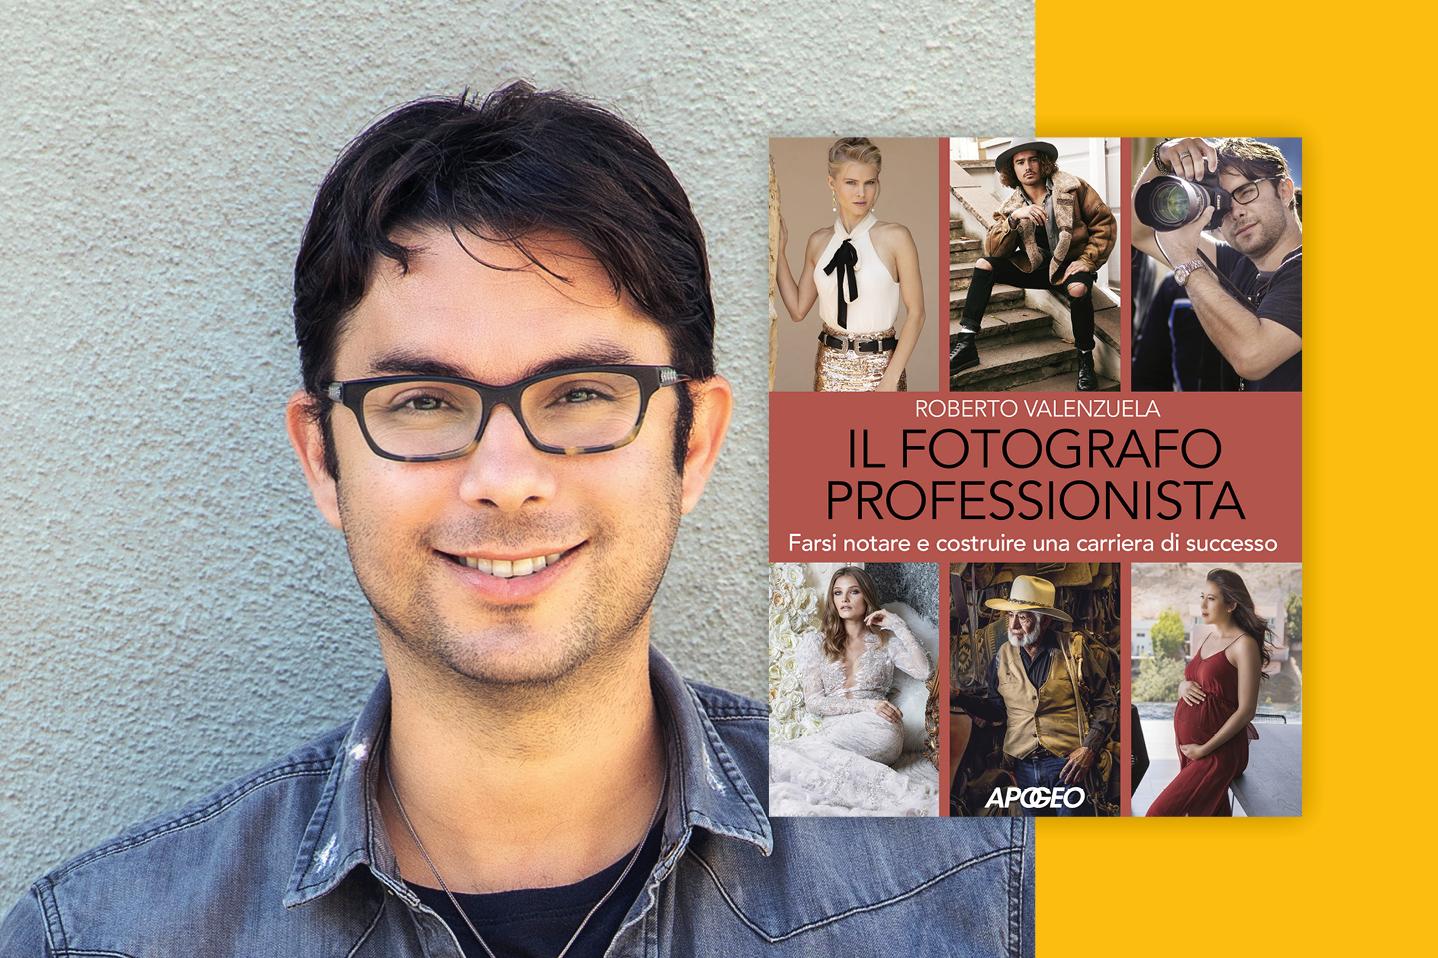 IlFotografoProfessionista-RobertoValenzuela